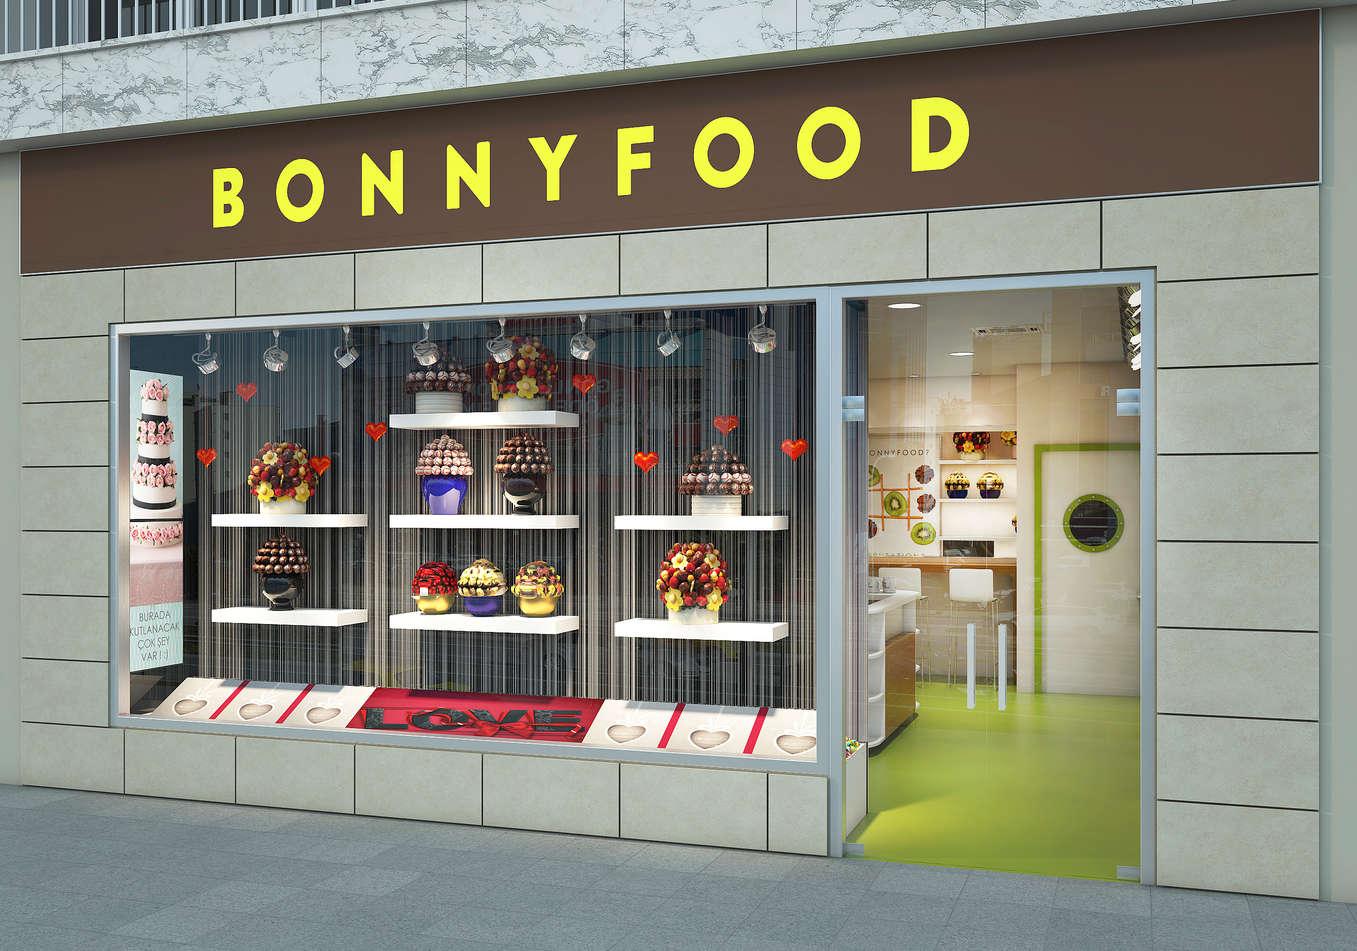 BONNY FOOD